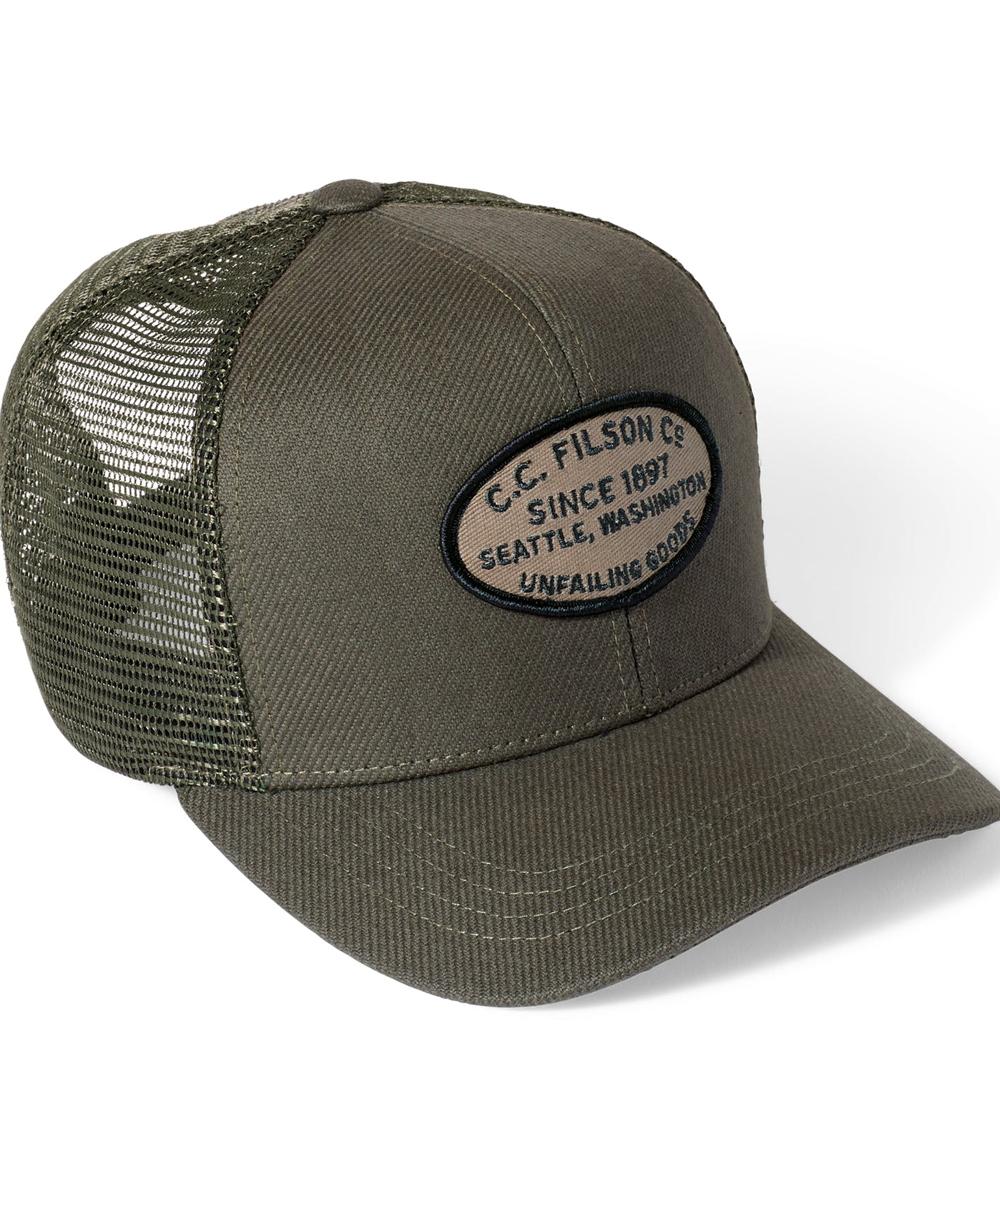 Men's Cap Buckshot Twill Otter Green